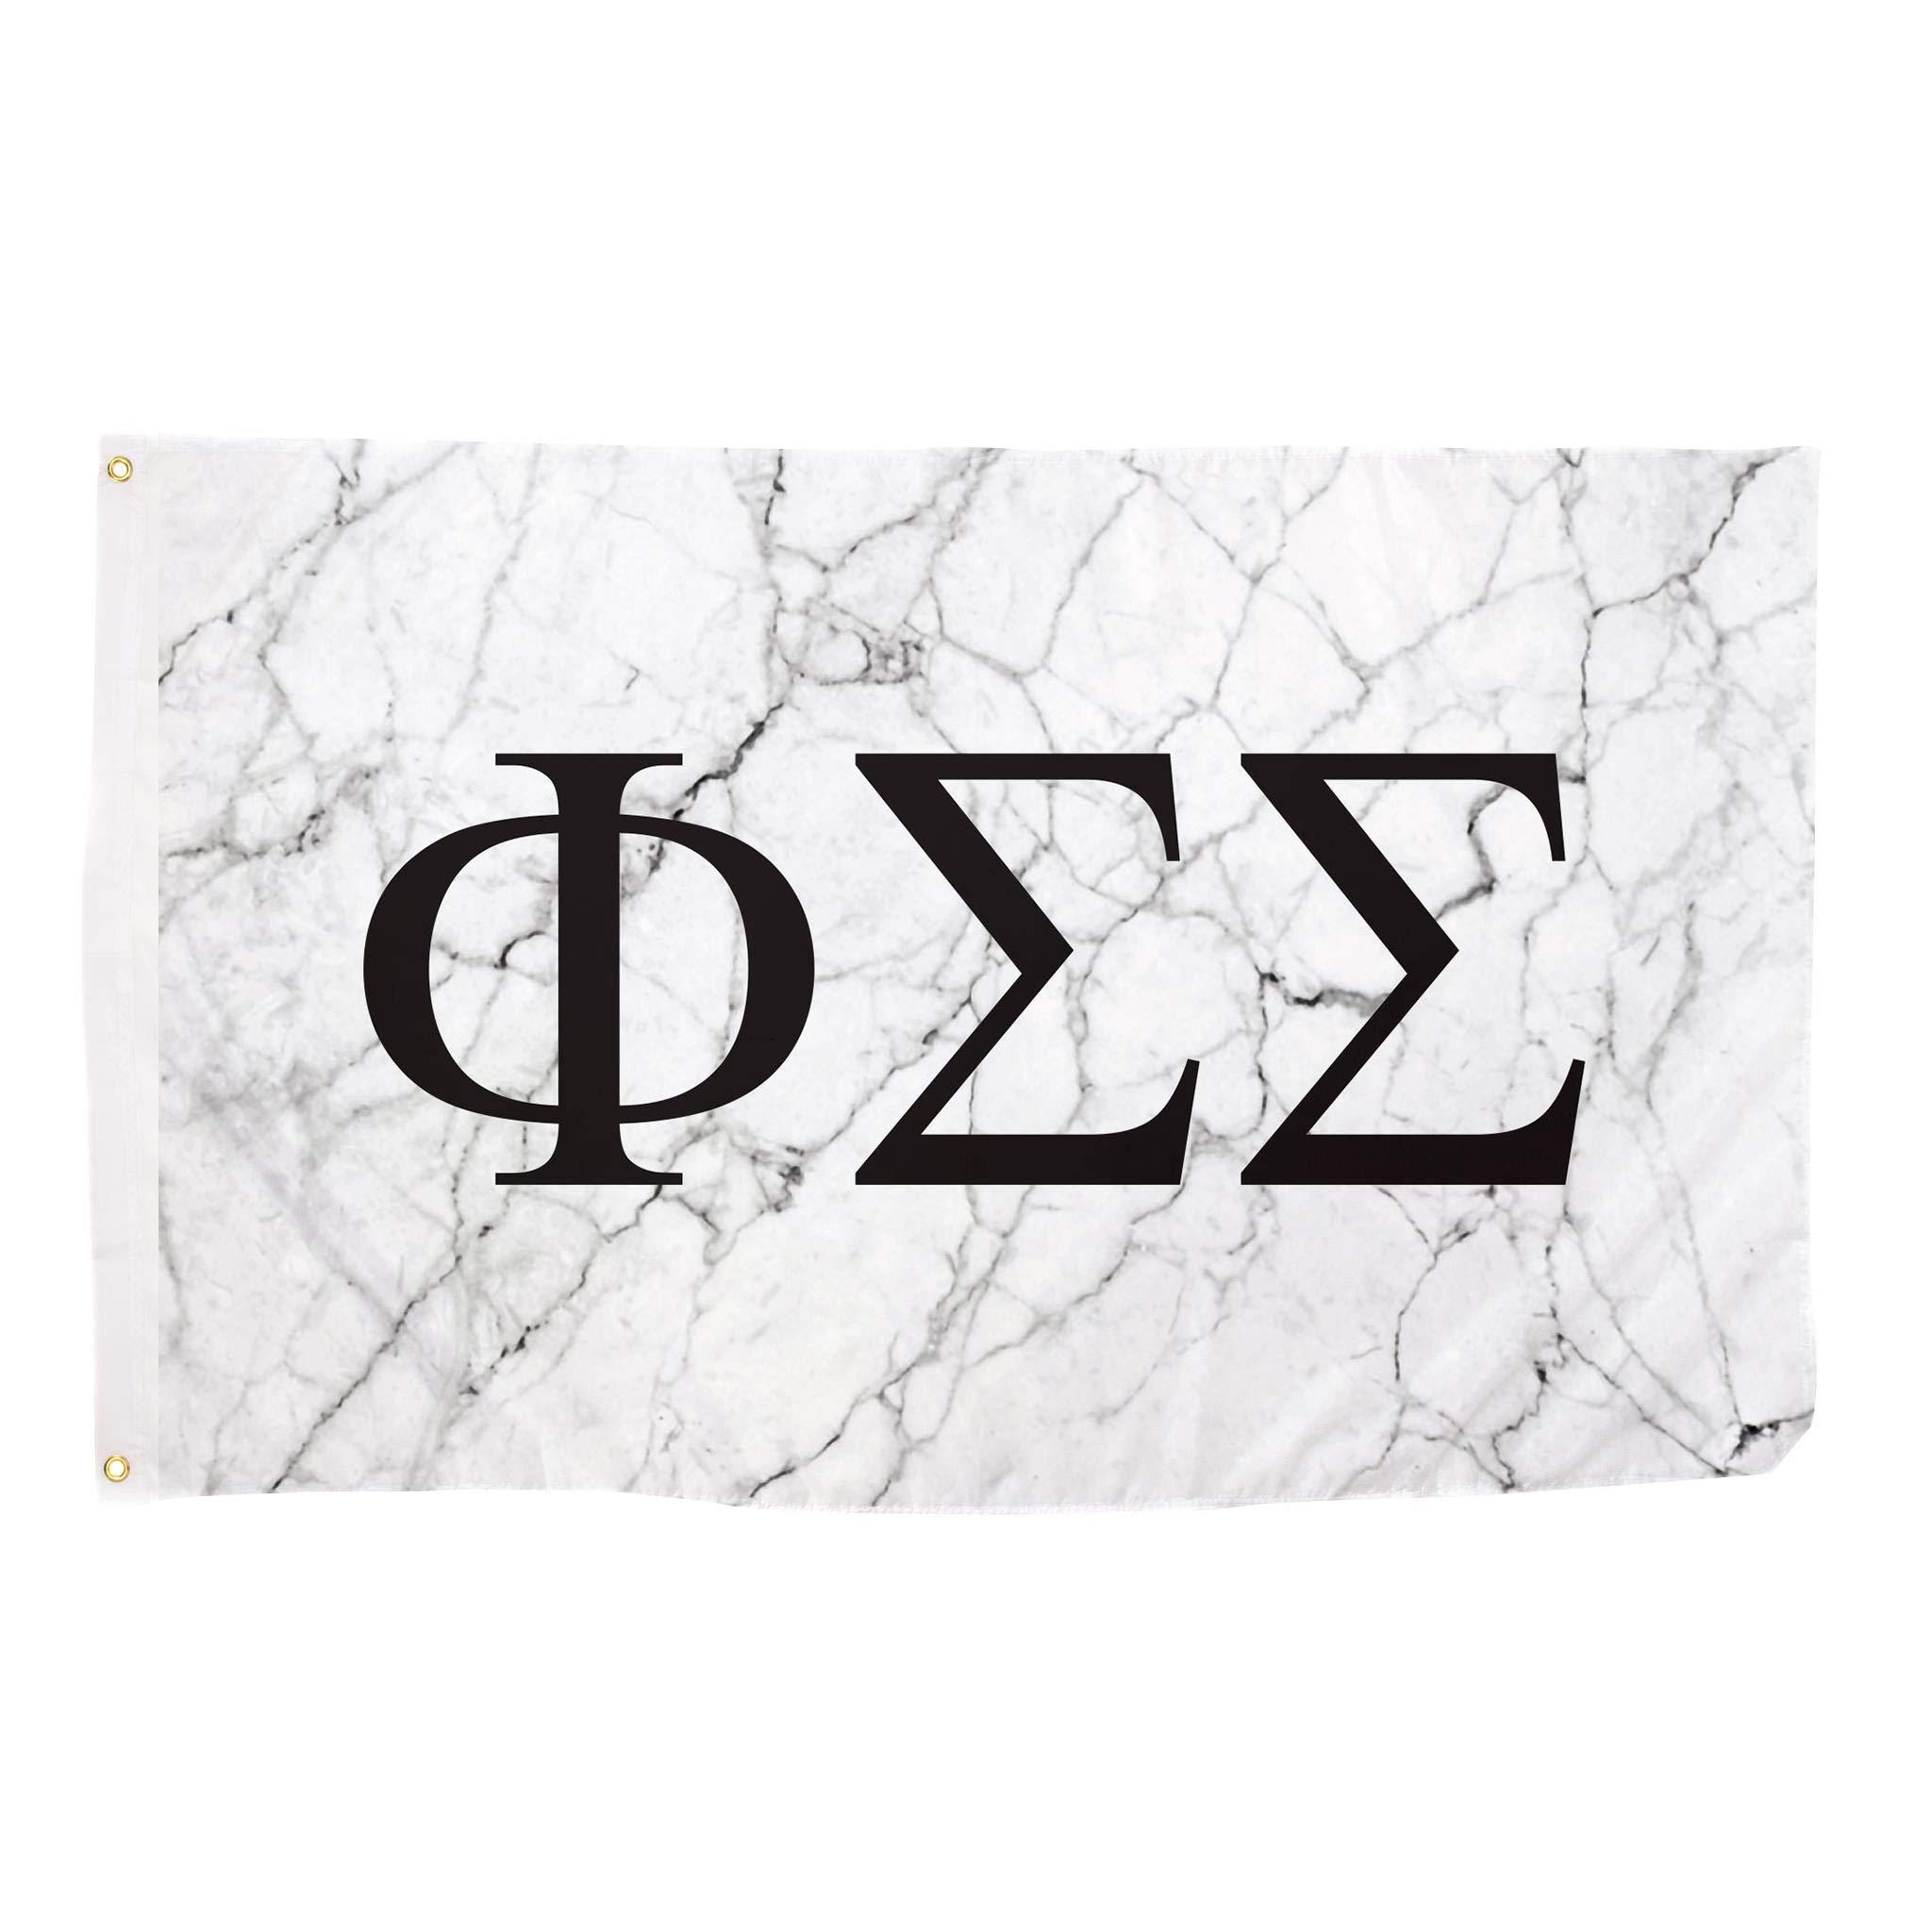 Phi Sigma Sigma Light Marble Sorority Letter Flag Banner 3 x 5 Sign Decor Phi Sig